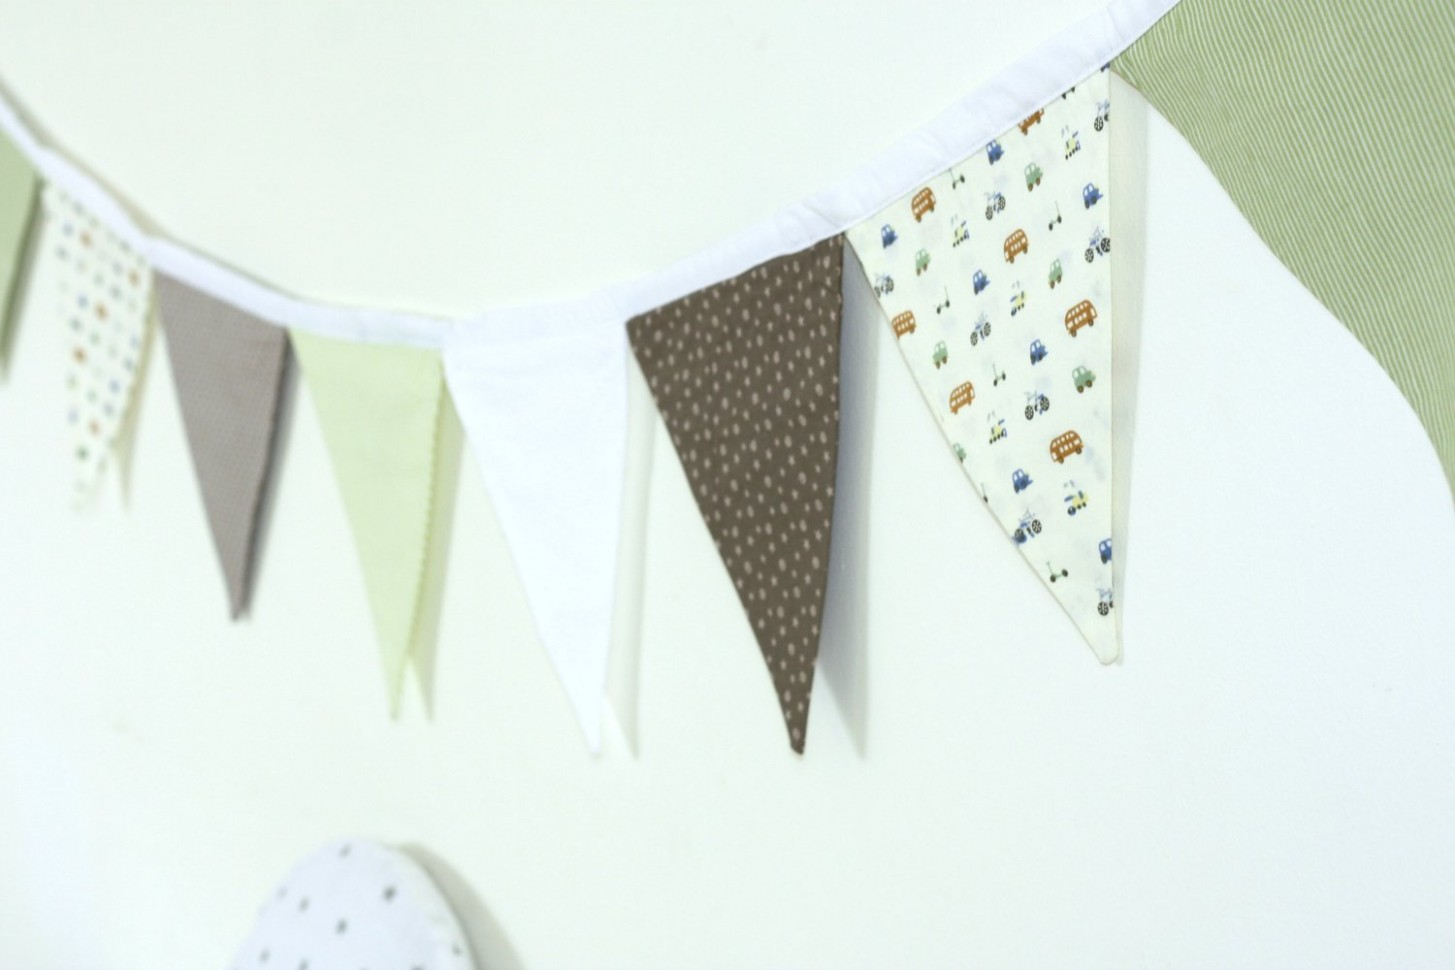 Wall Decoration, Nursery Decor, Baby Boy Room, Fabric Garland  - Baby Room Garland